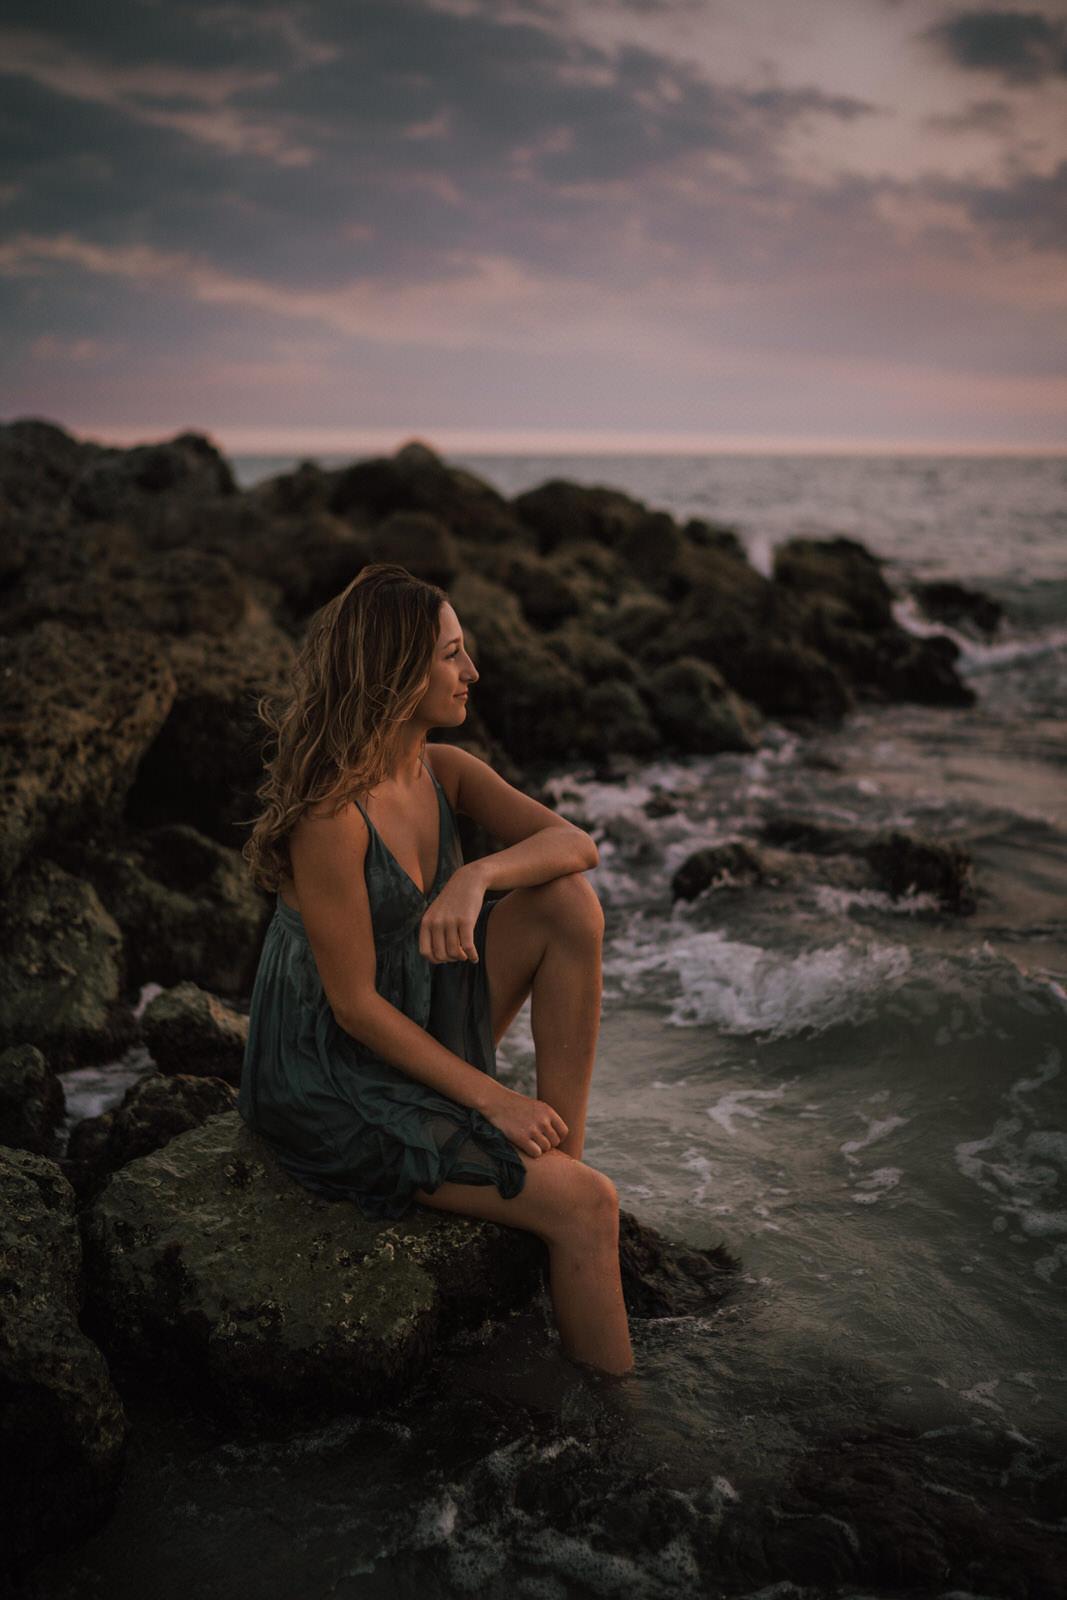 Fort Myers Senior Photos on Bonita Beach - Michelle Gonzalez Photography - Sammie-217.JPG